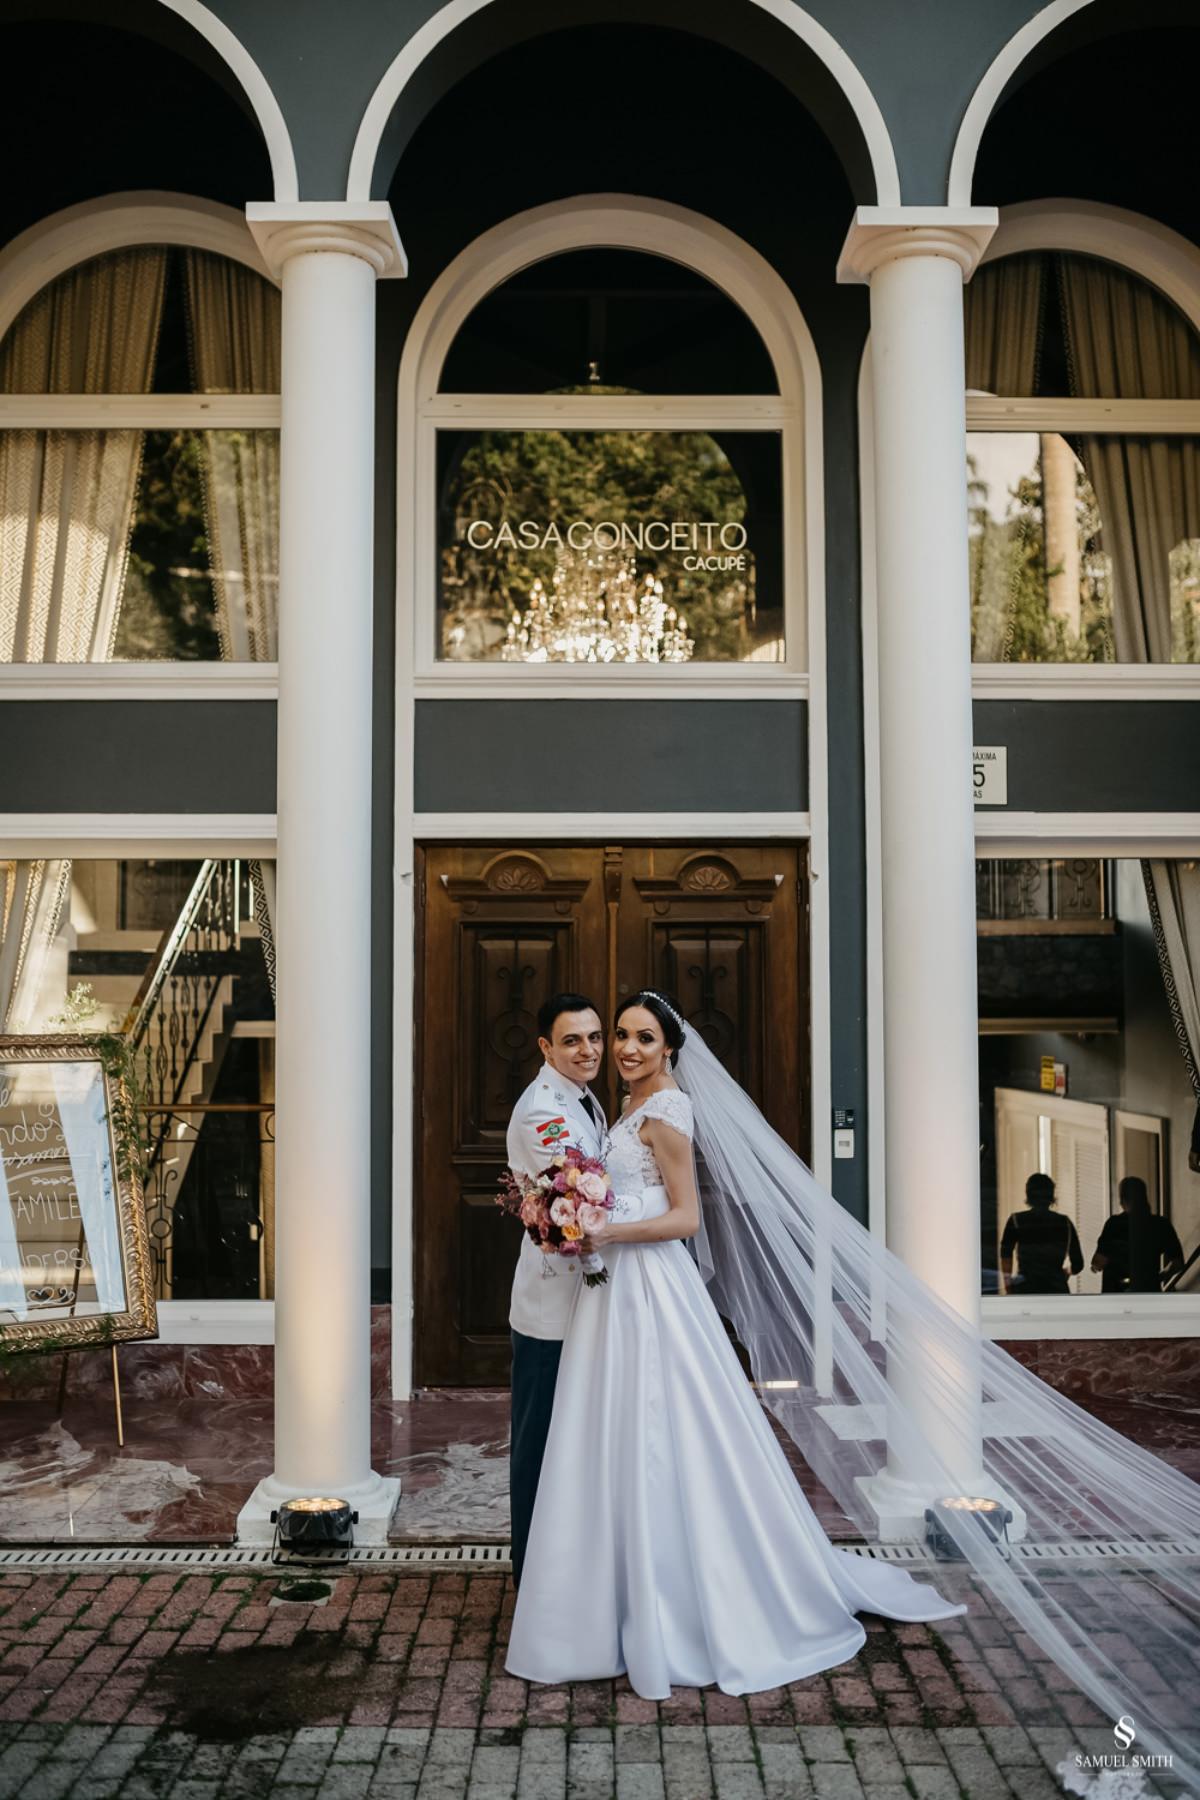 casamento casa conceito cacupé florianópolis sc fotógrafo fotos samuel smith (103)